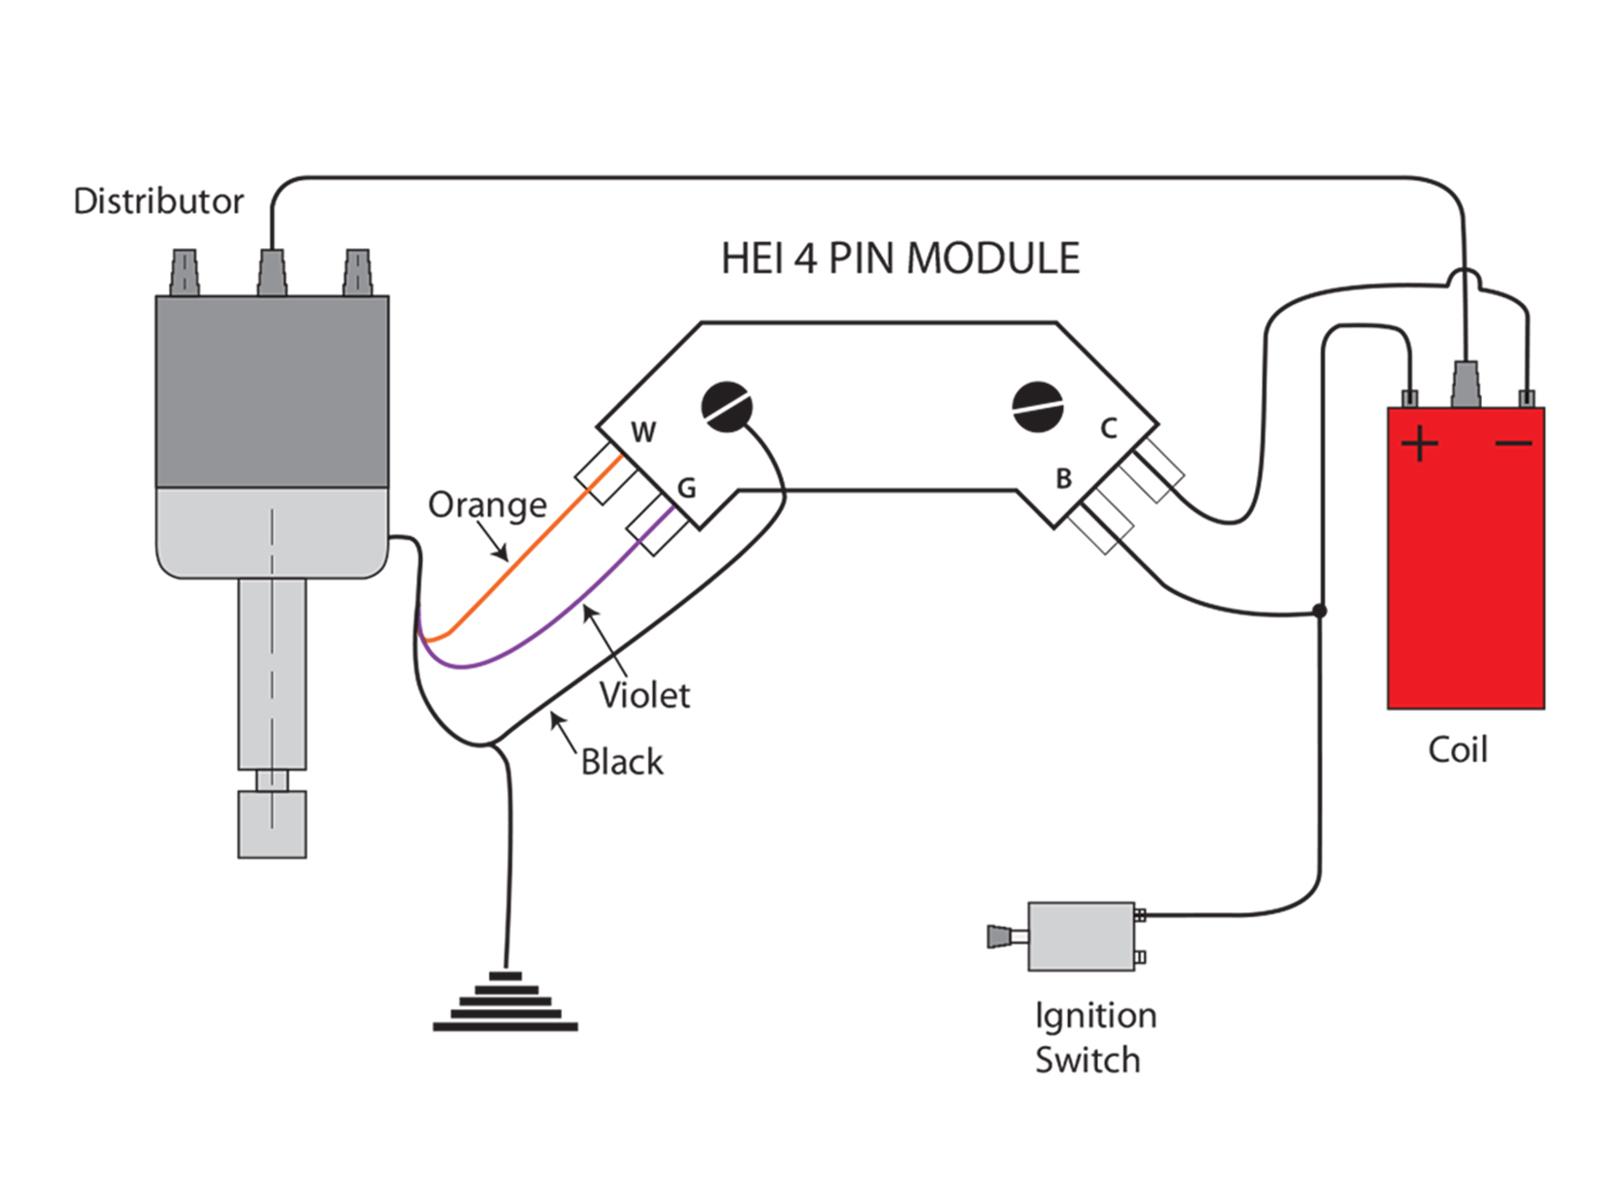 Gm Hei Ignition Diagram - Data Wiring Diagram Today - Ford Ignition Control Module Wiring Diagram